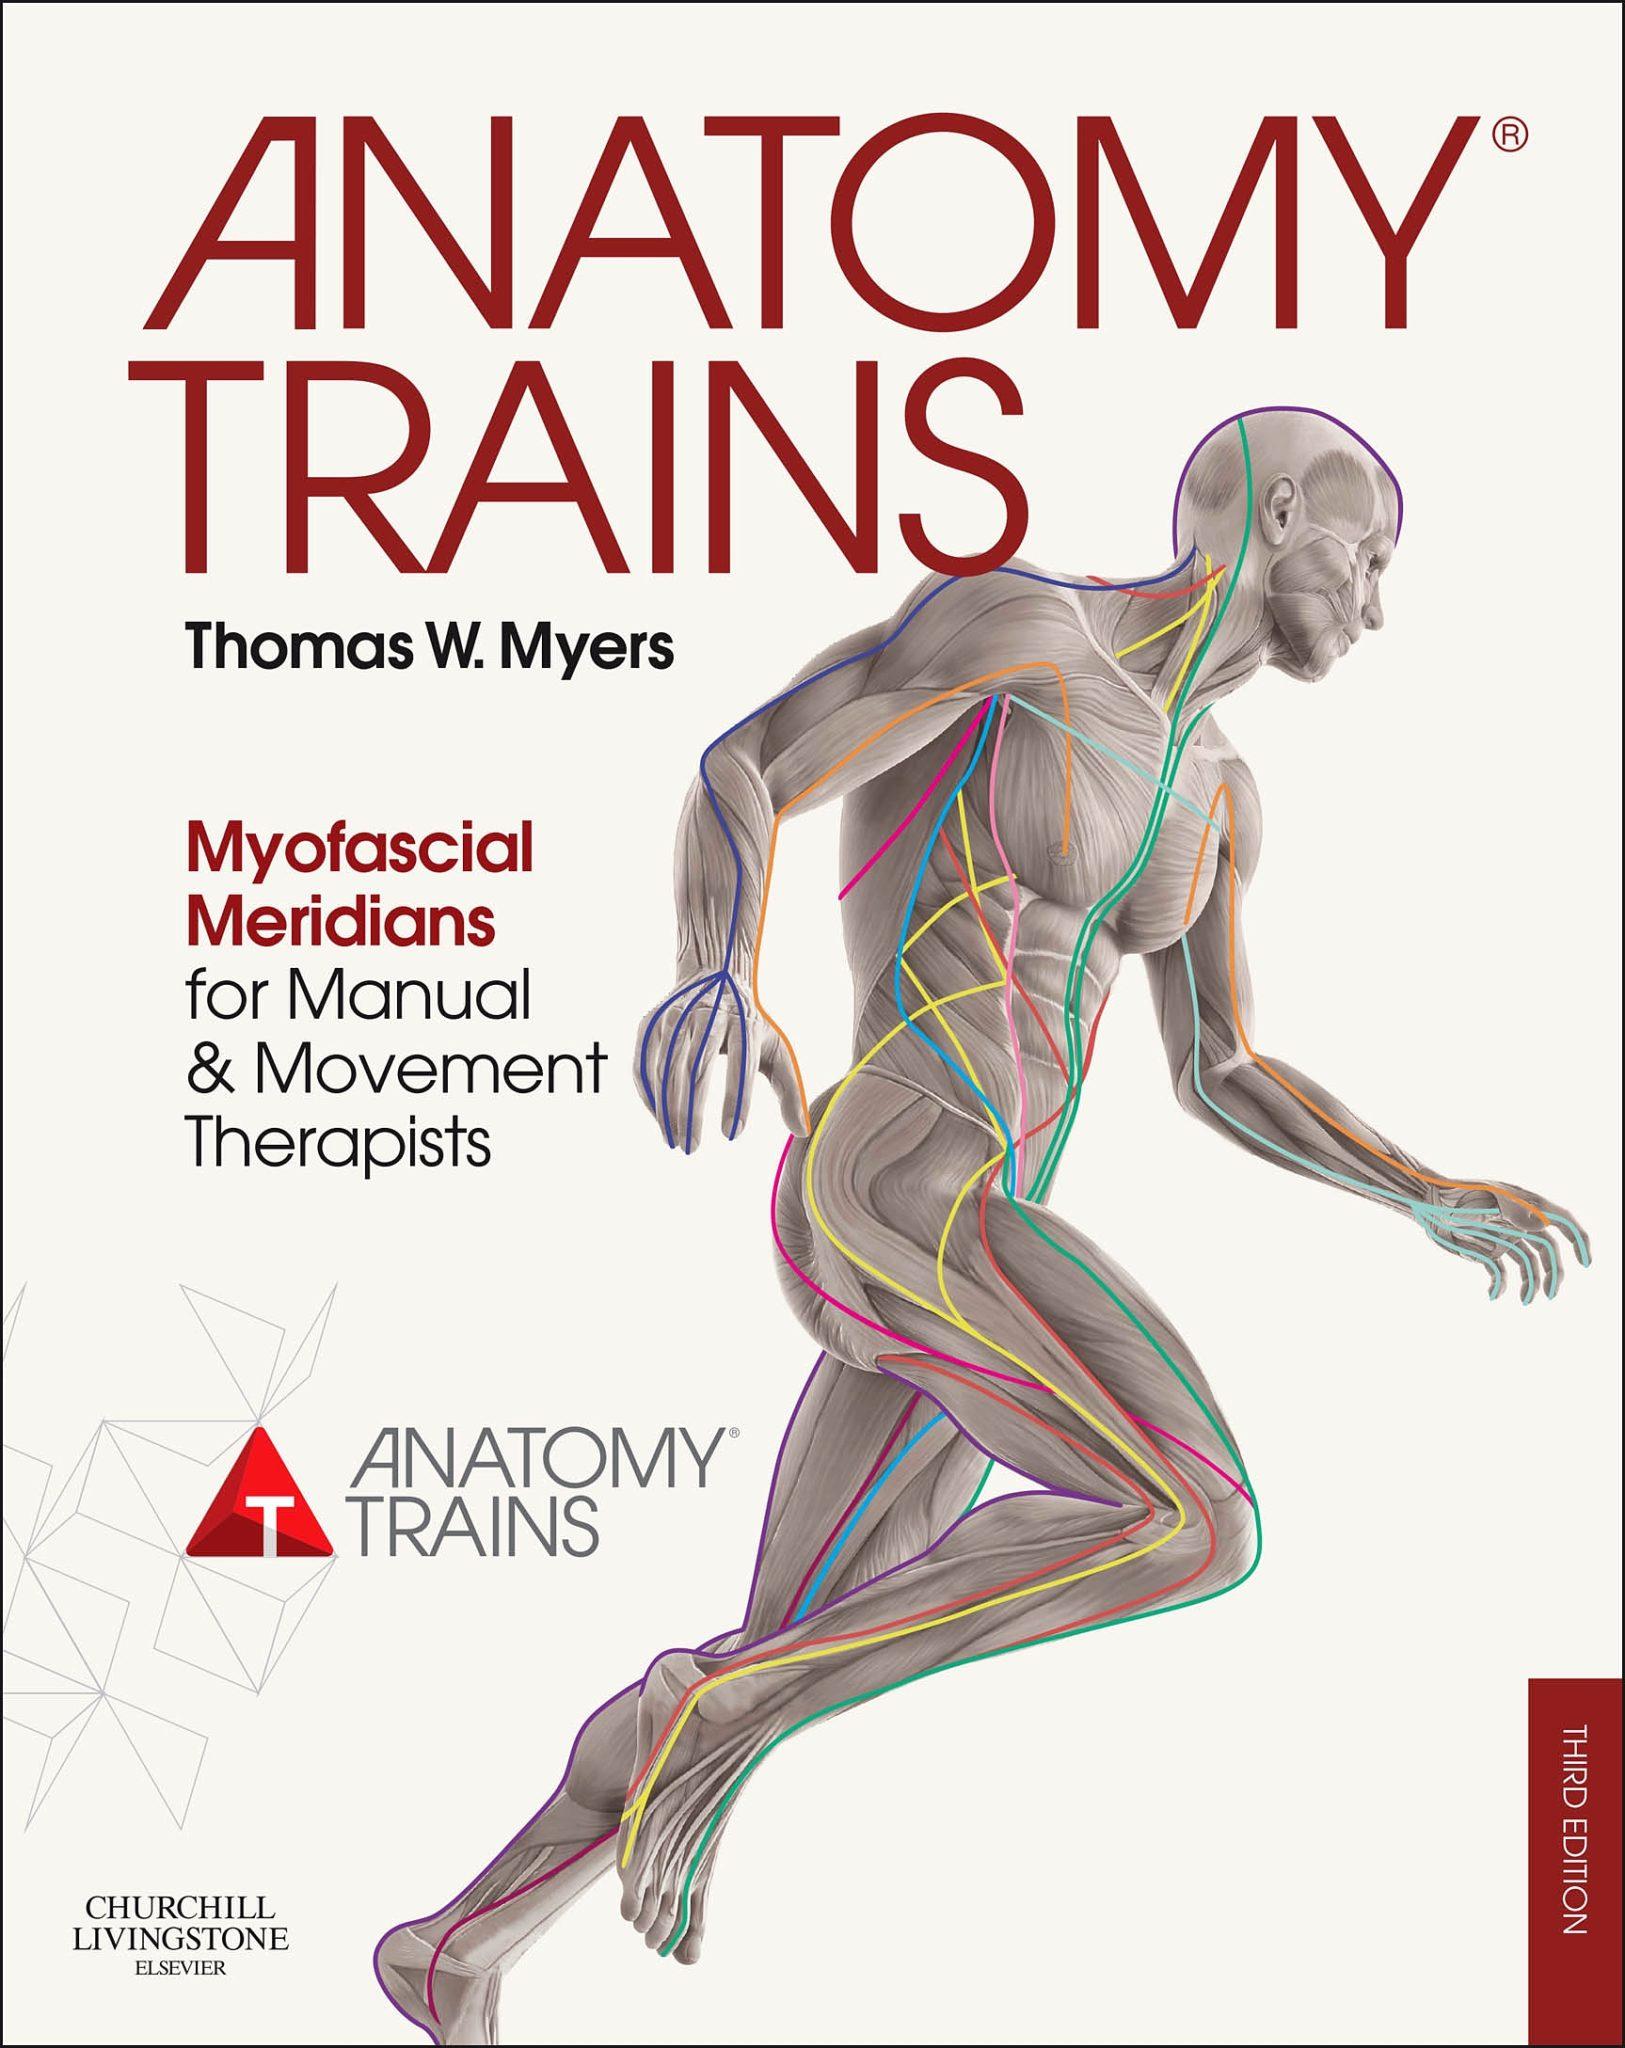 Anatomy-Trains-3e-Cover-72dpi.jpg